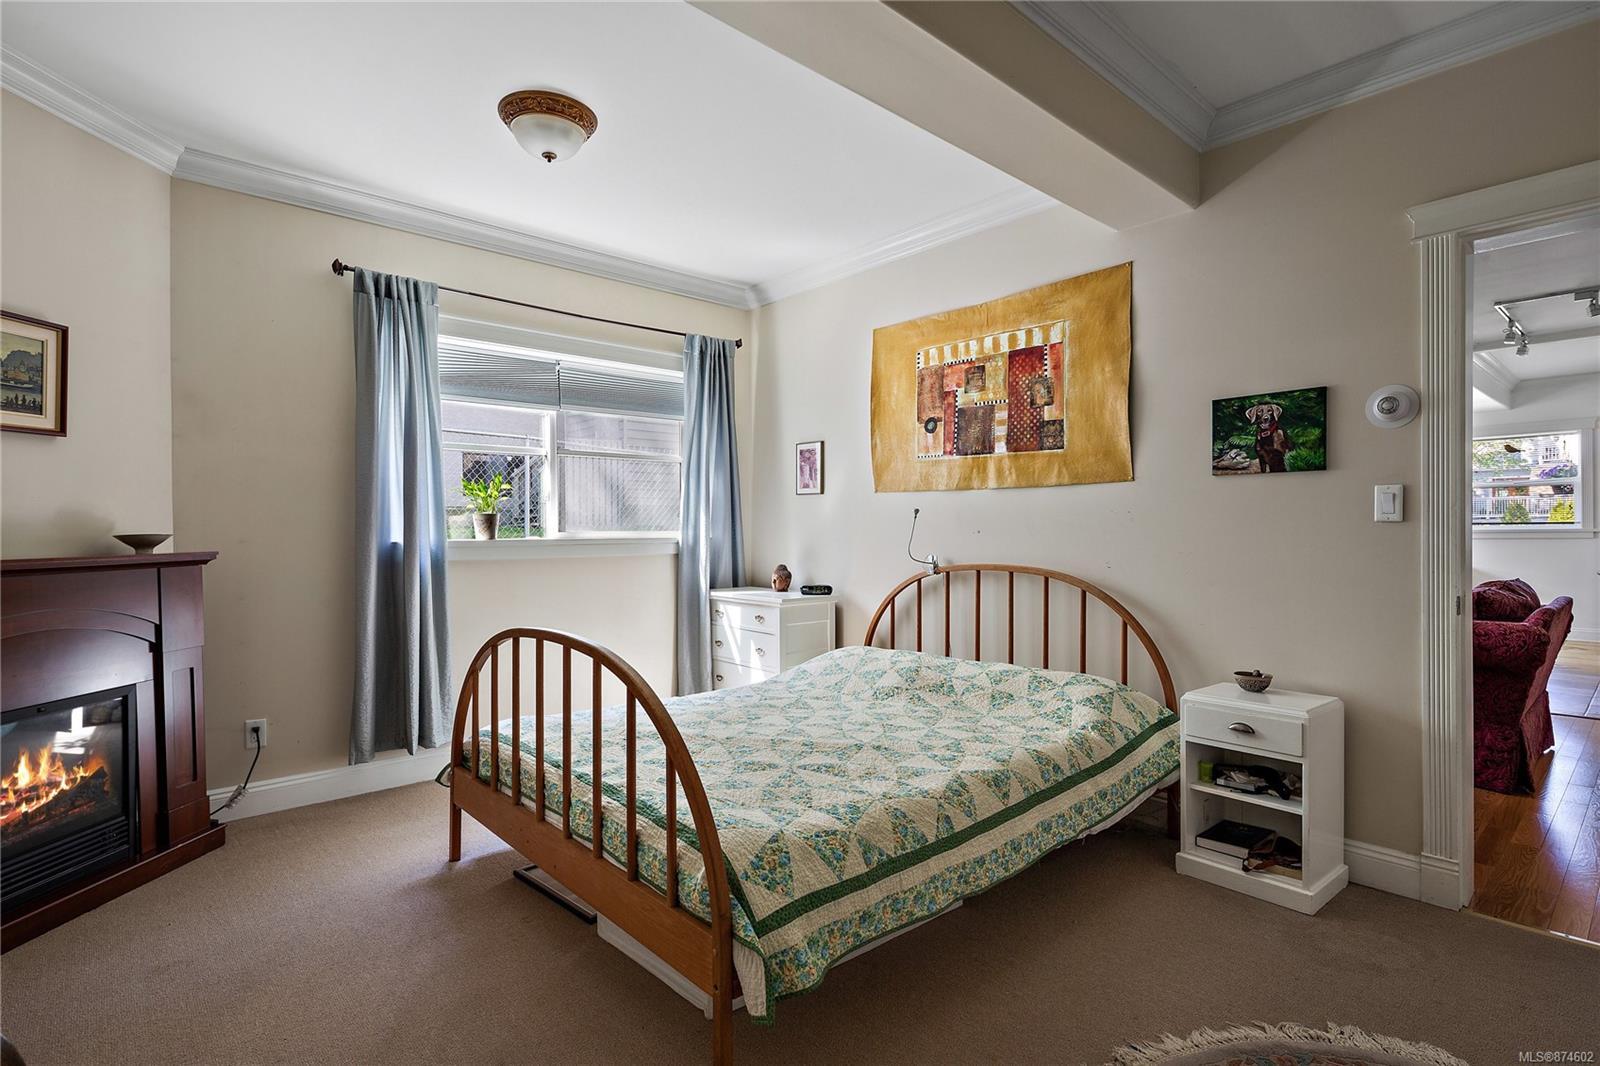 Photo 14 at 1 - 1376 Pandora Avenue, Fernwood, Victoria